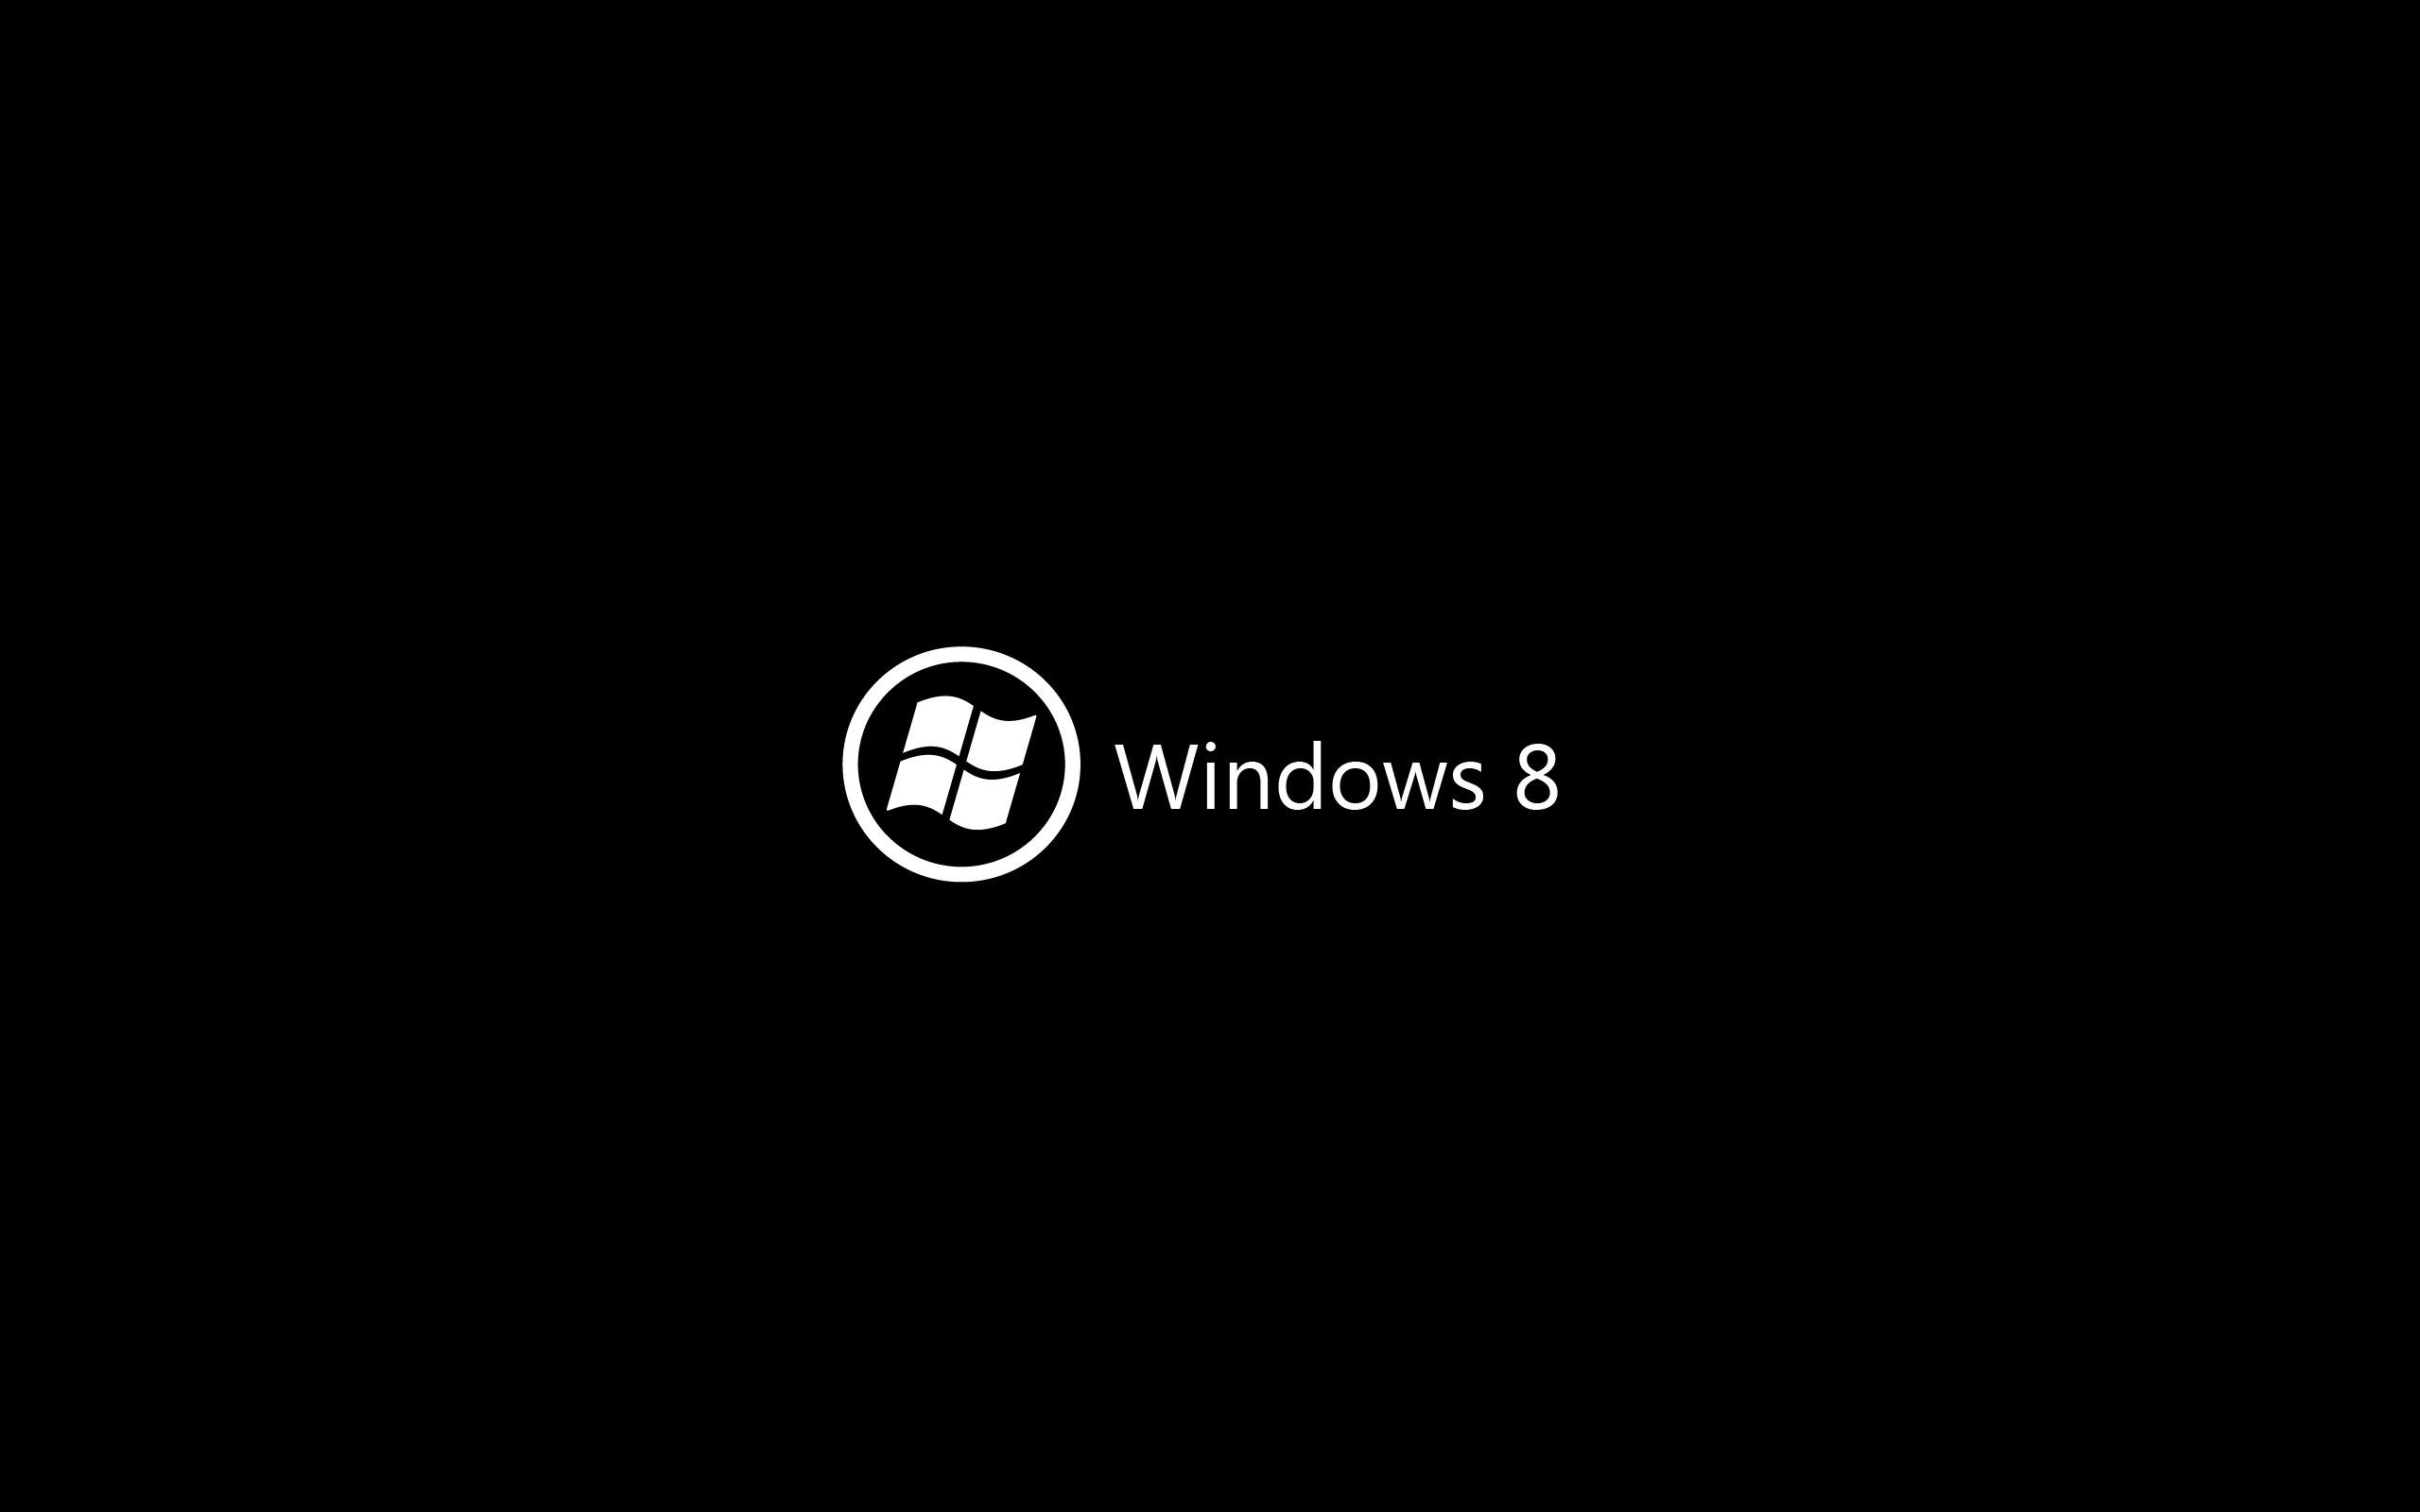 Entertainment Free Microsoft Windows Pickmore 42809 Wallpaper